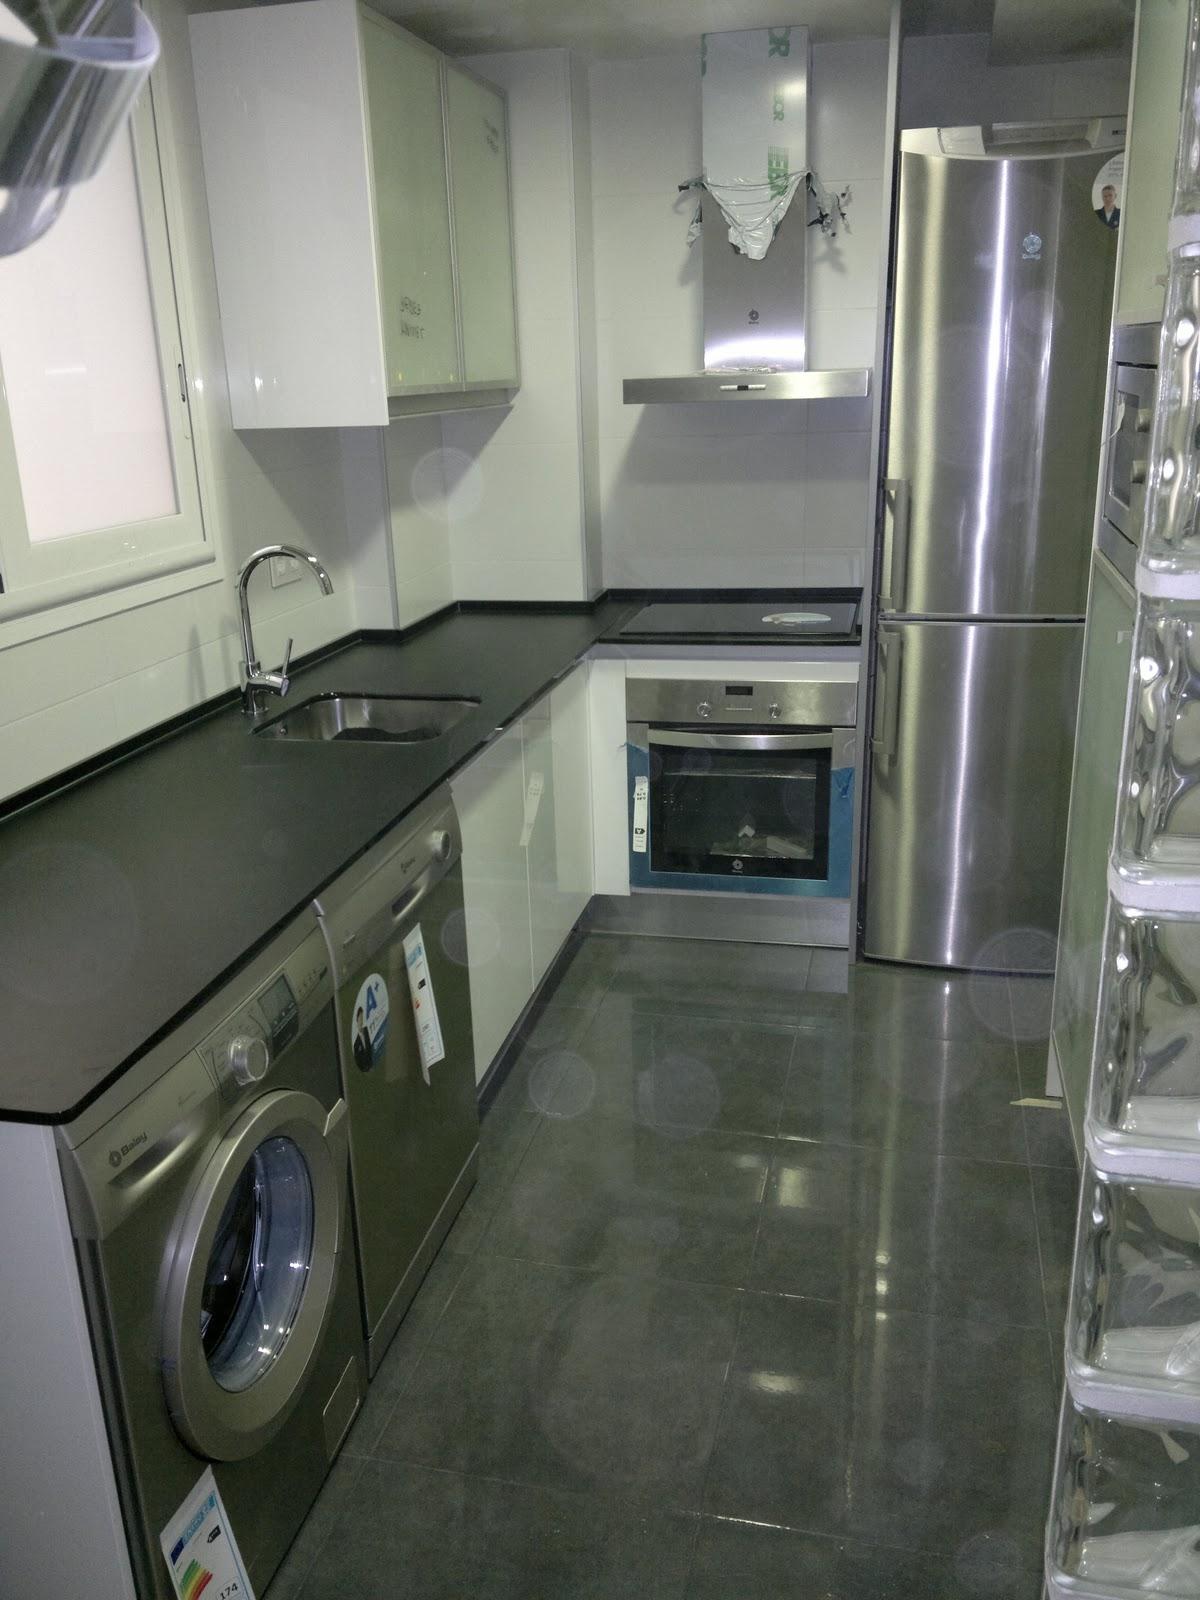 Ebanisteria carpinteria manuel perez zaragoza cocina - Encimeras de cocina de cristal ...